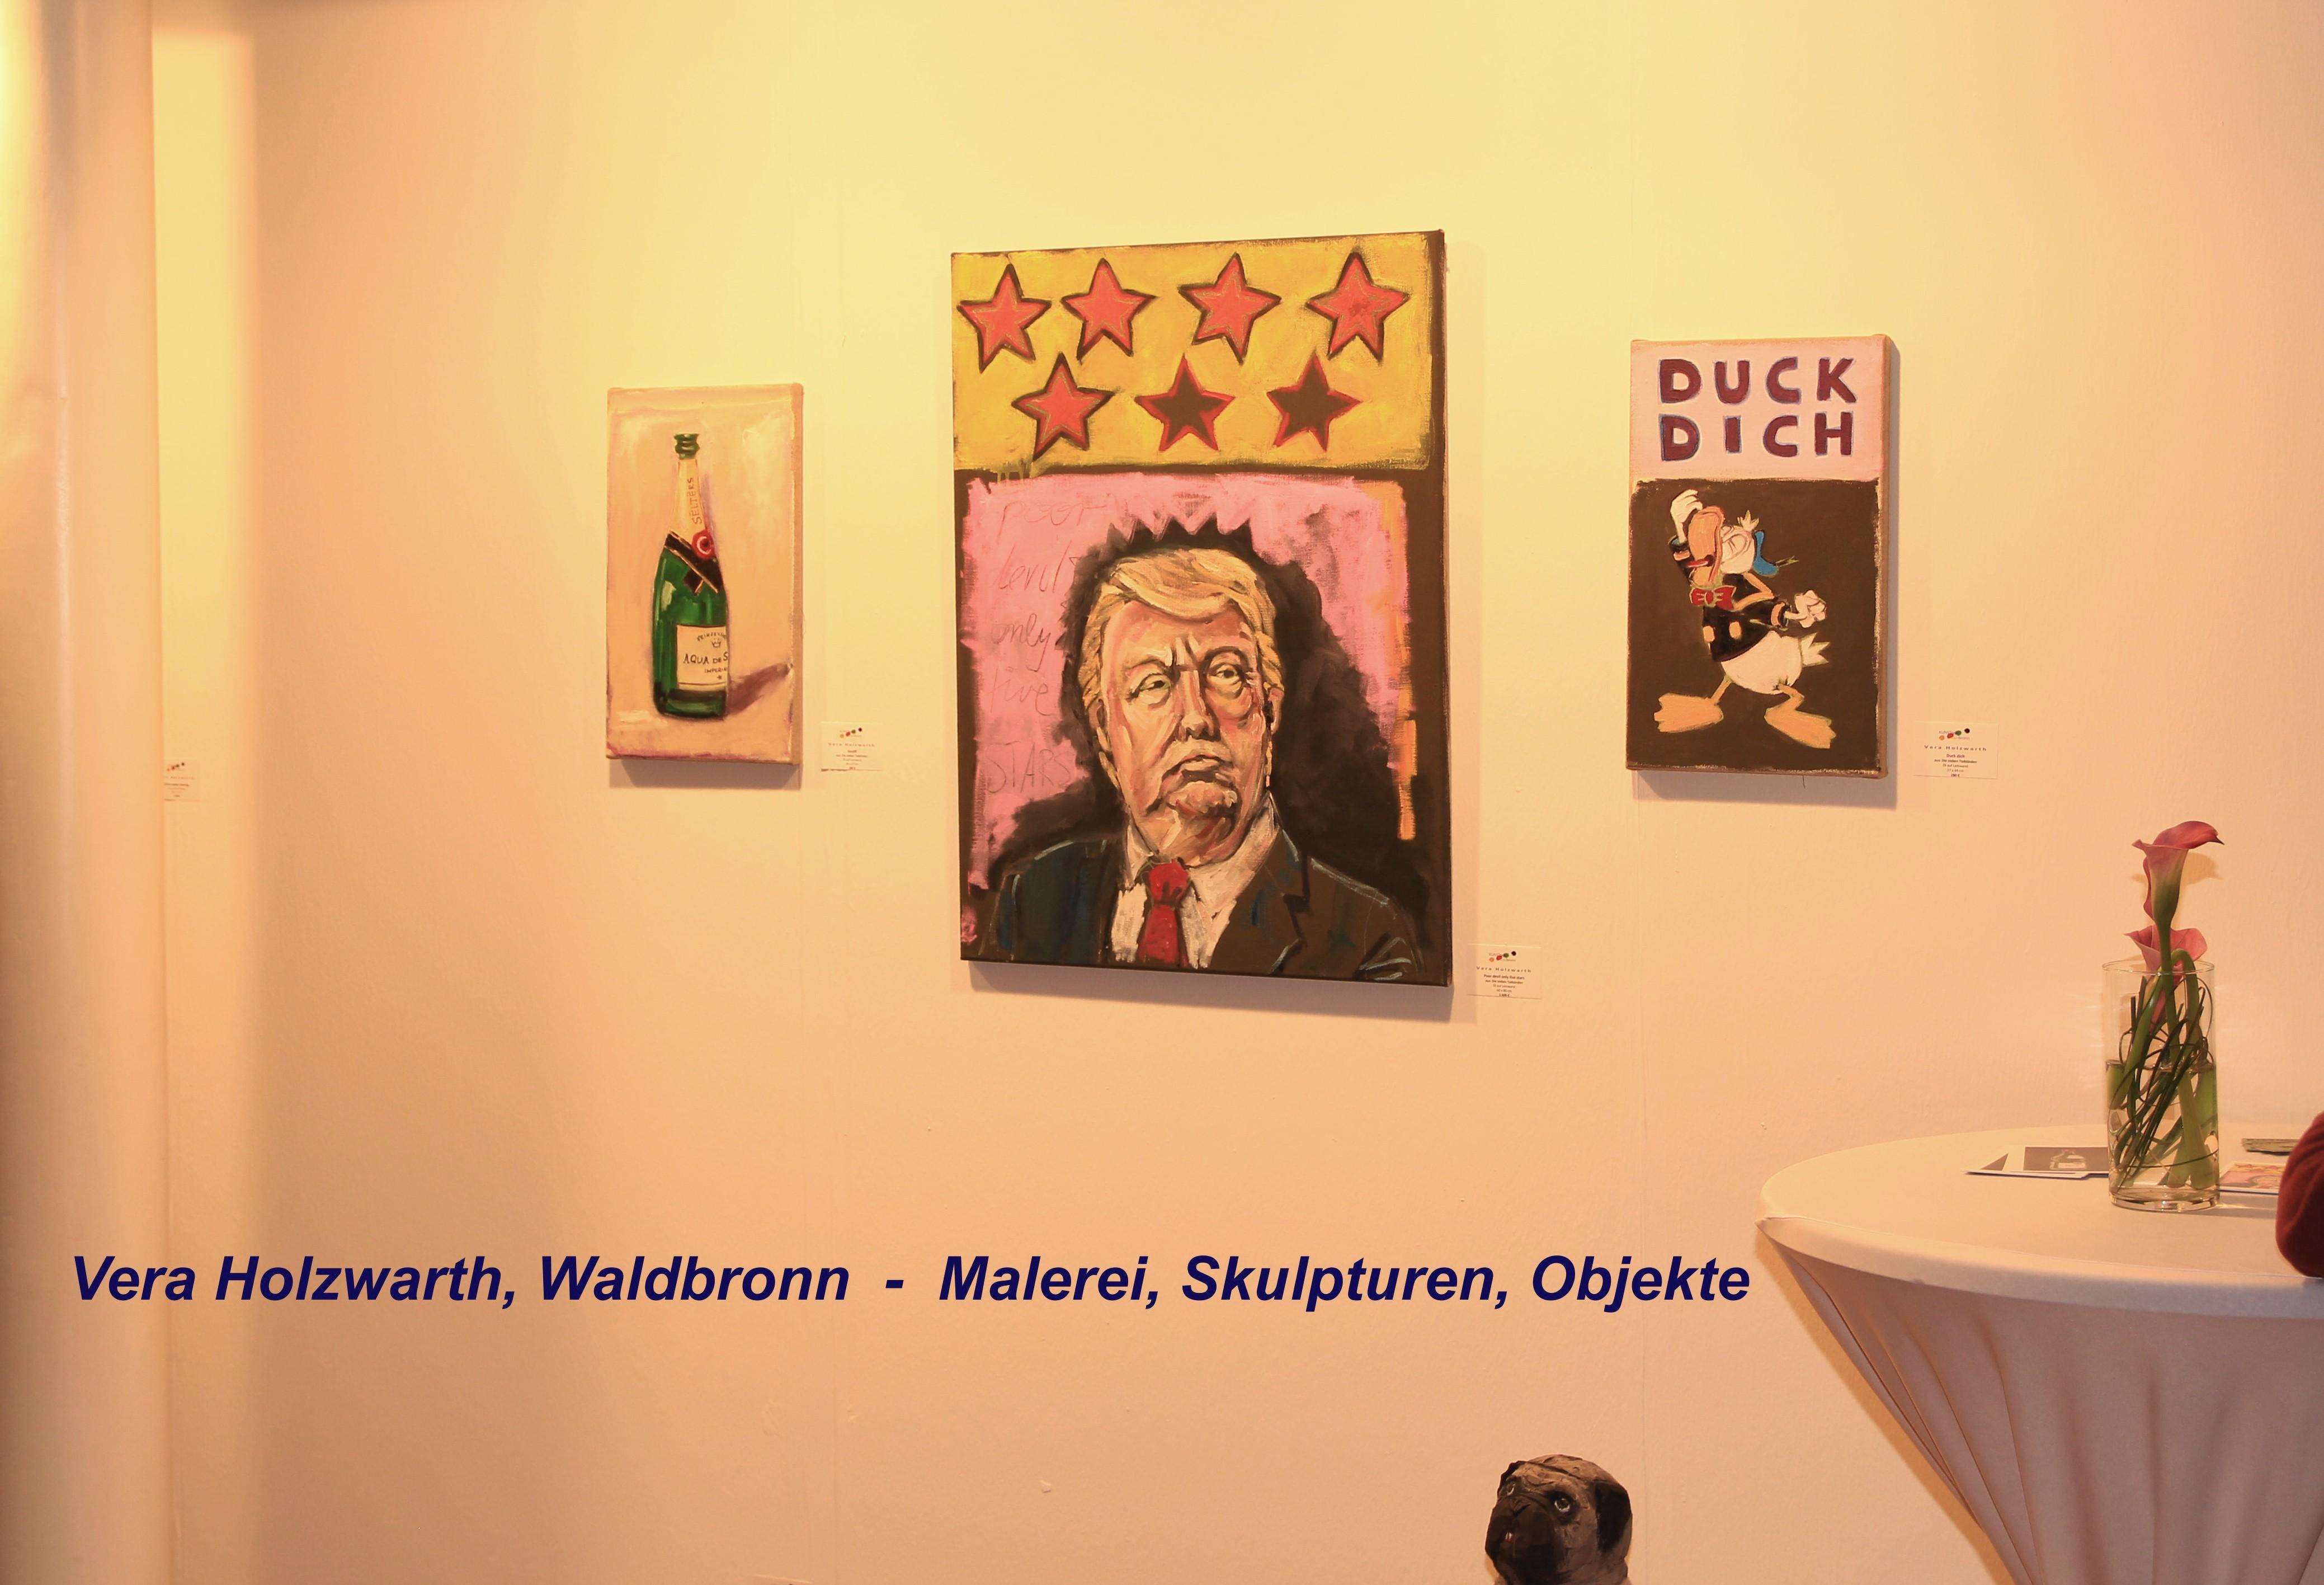 Vera Holzwarth, Waldbronn - Malerei, Skulpturen, Objekte